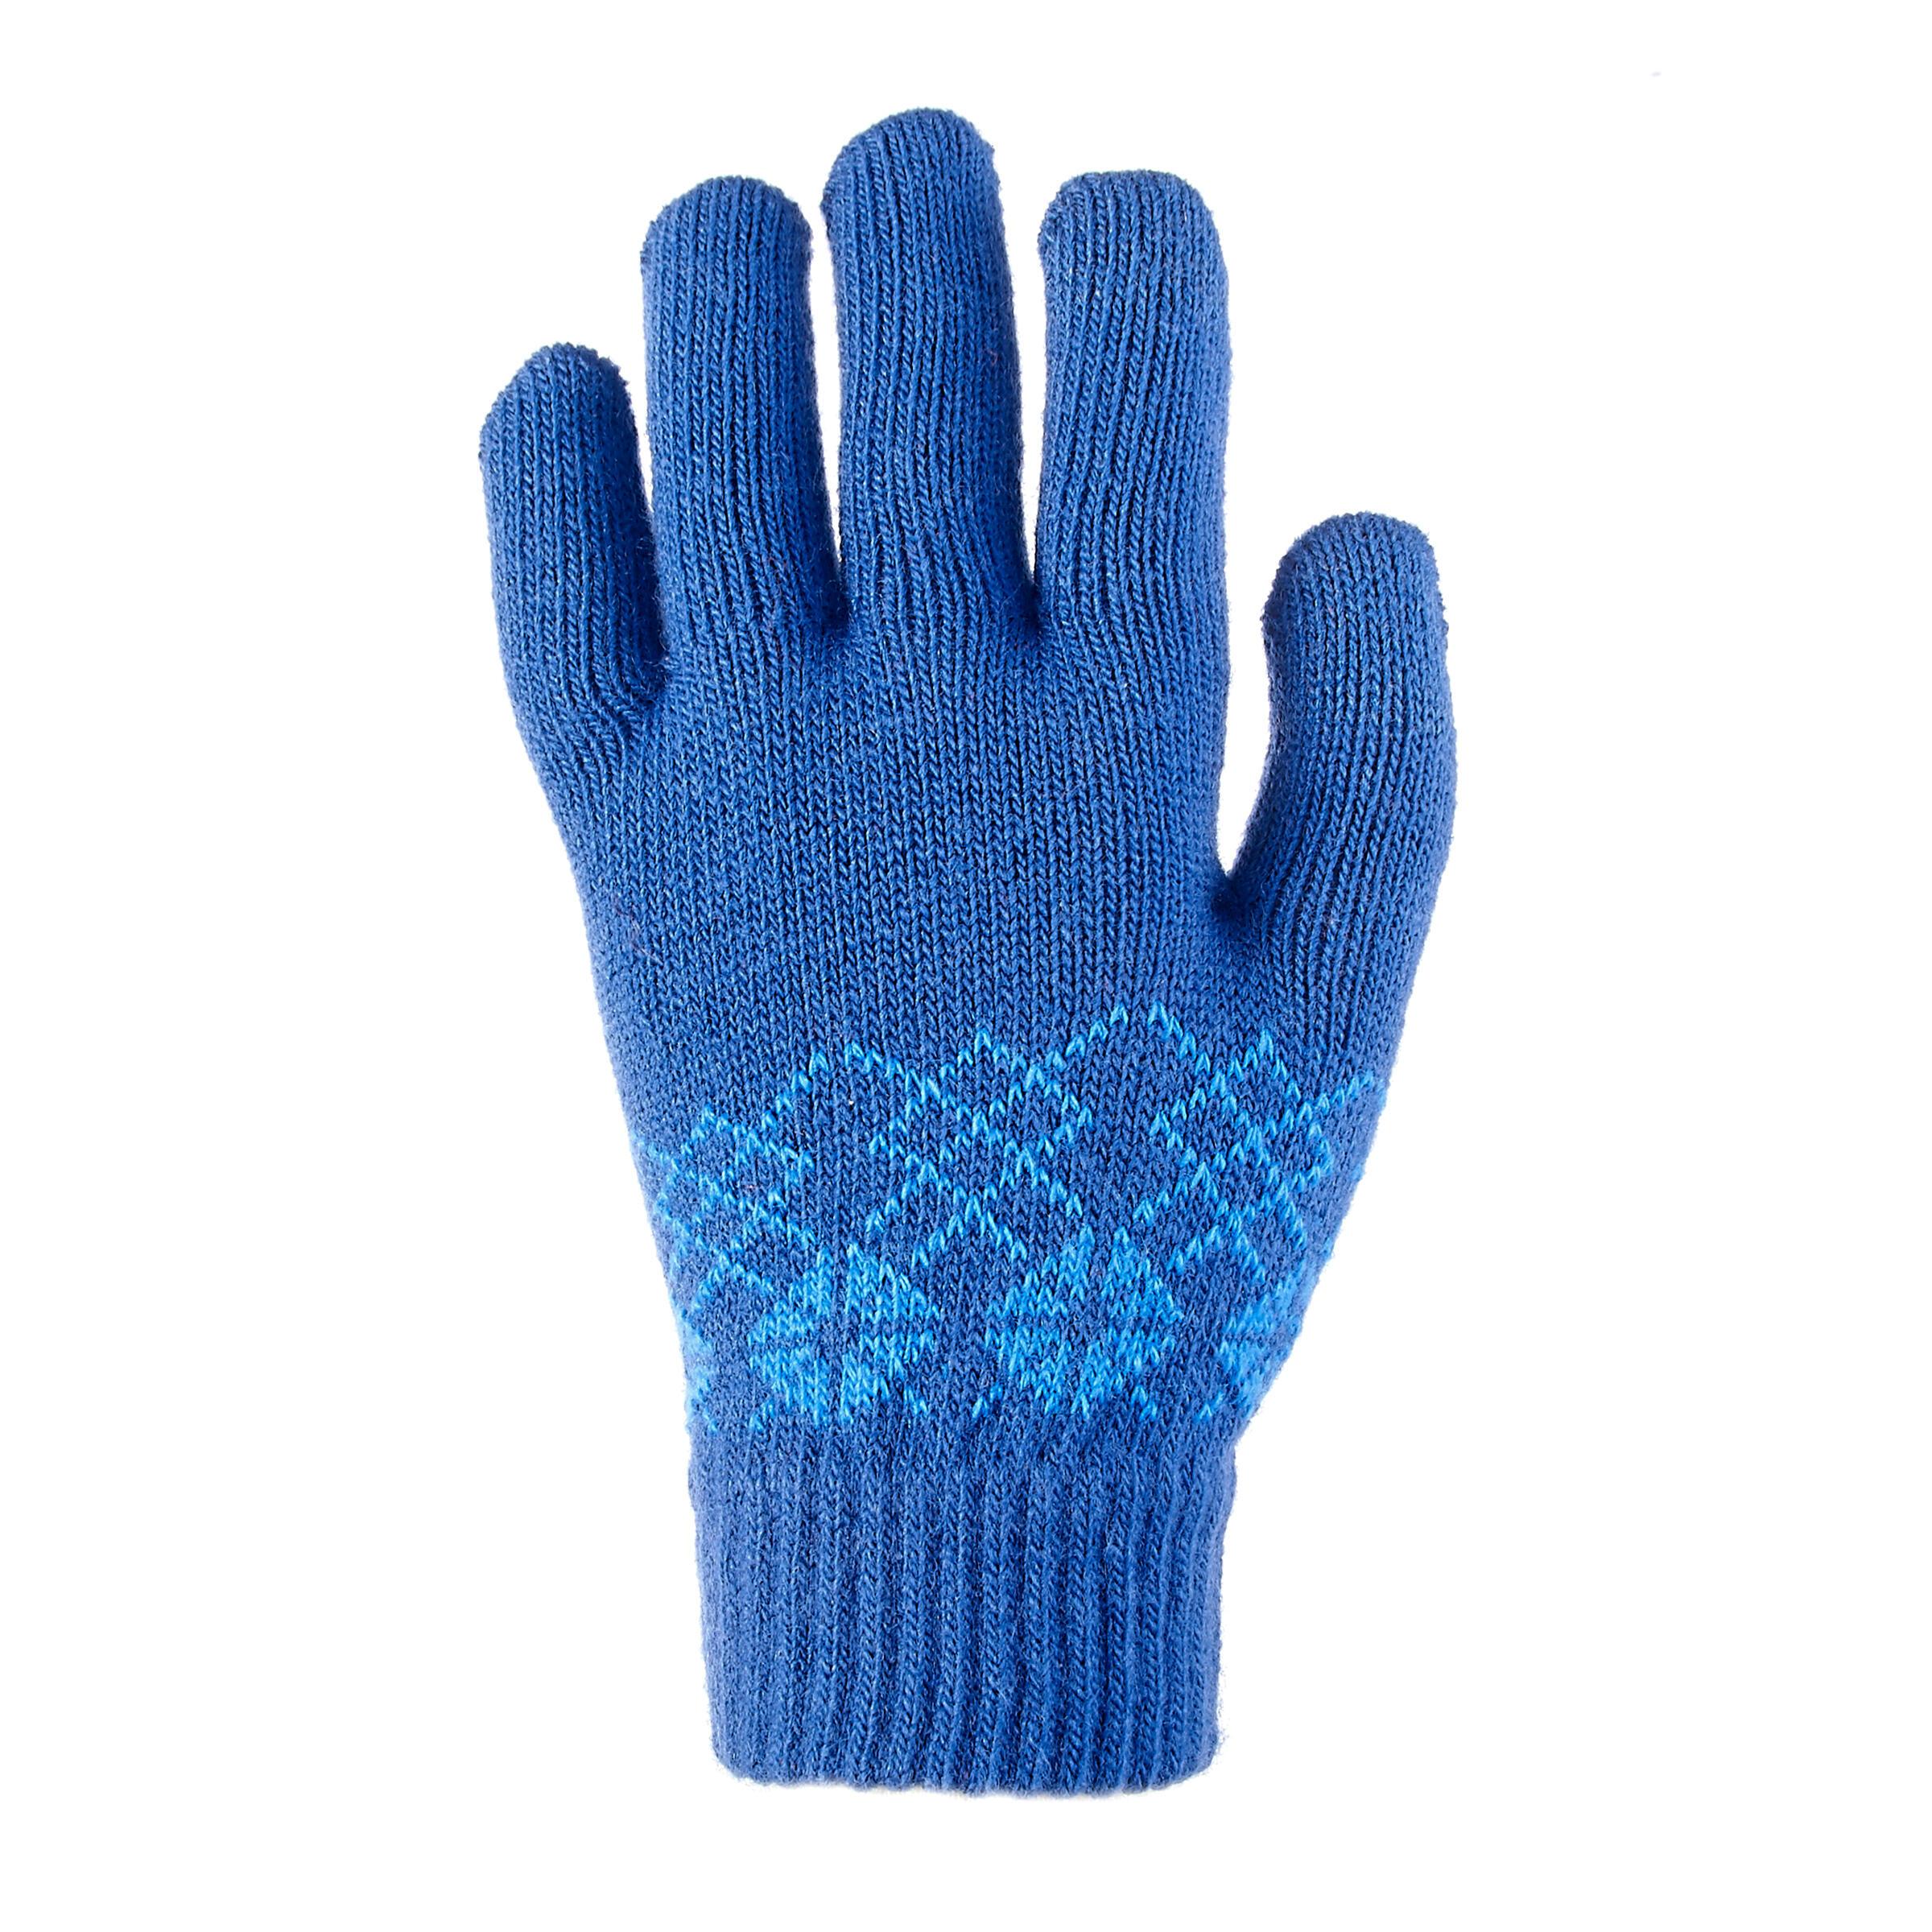 SH100 Warm Child's Hiking Knit Gloves-Blue